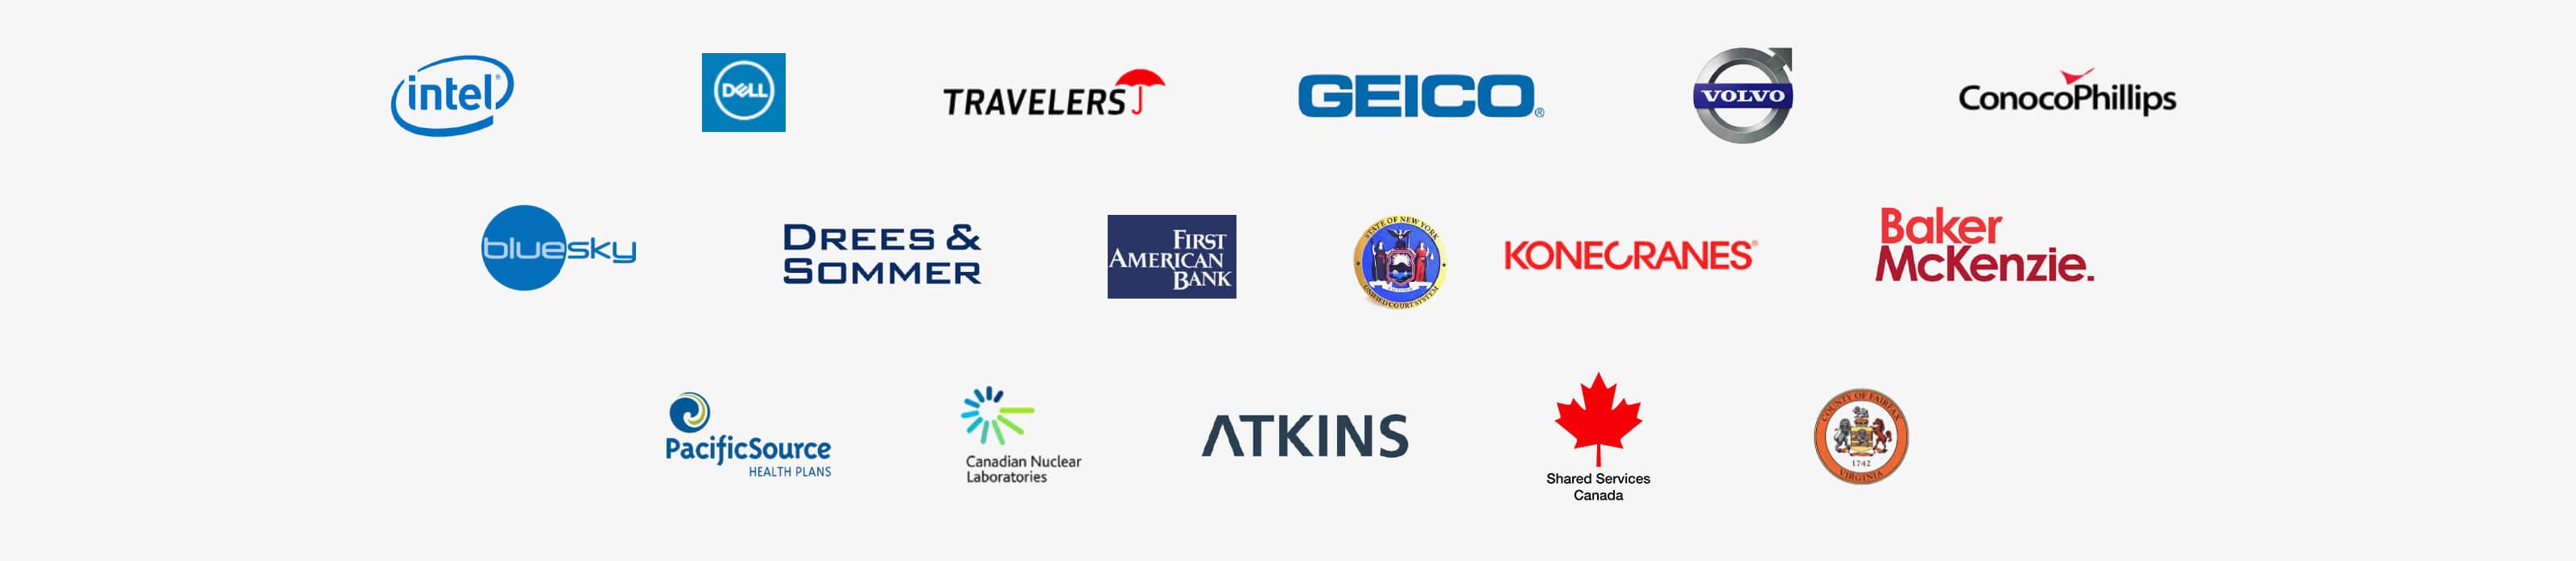 Foxit Customer Logos 2019